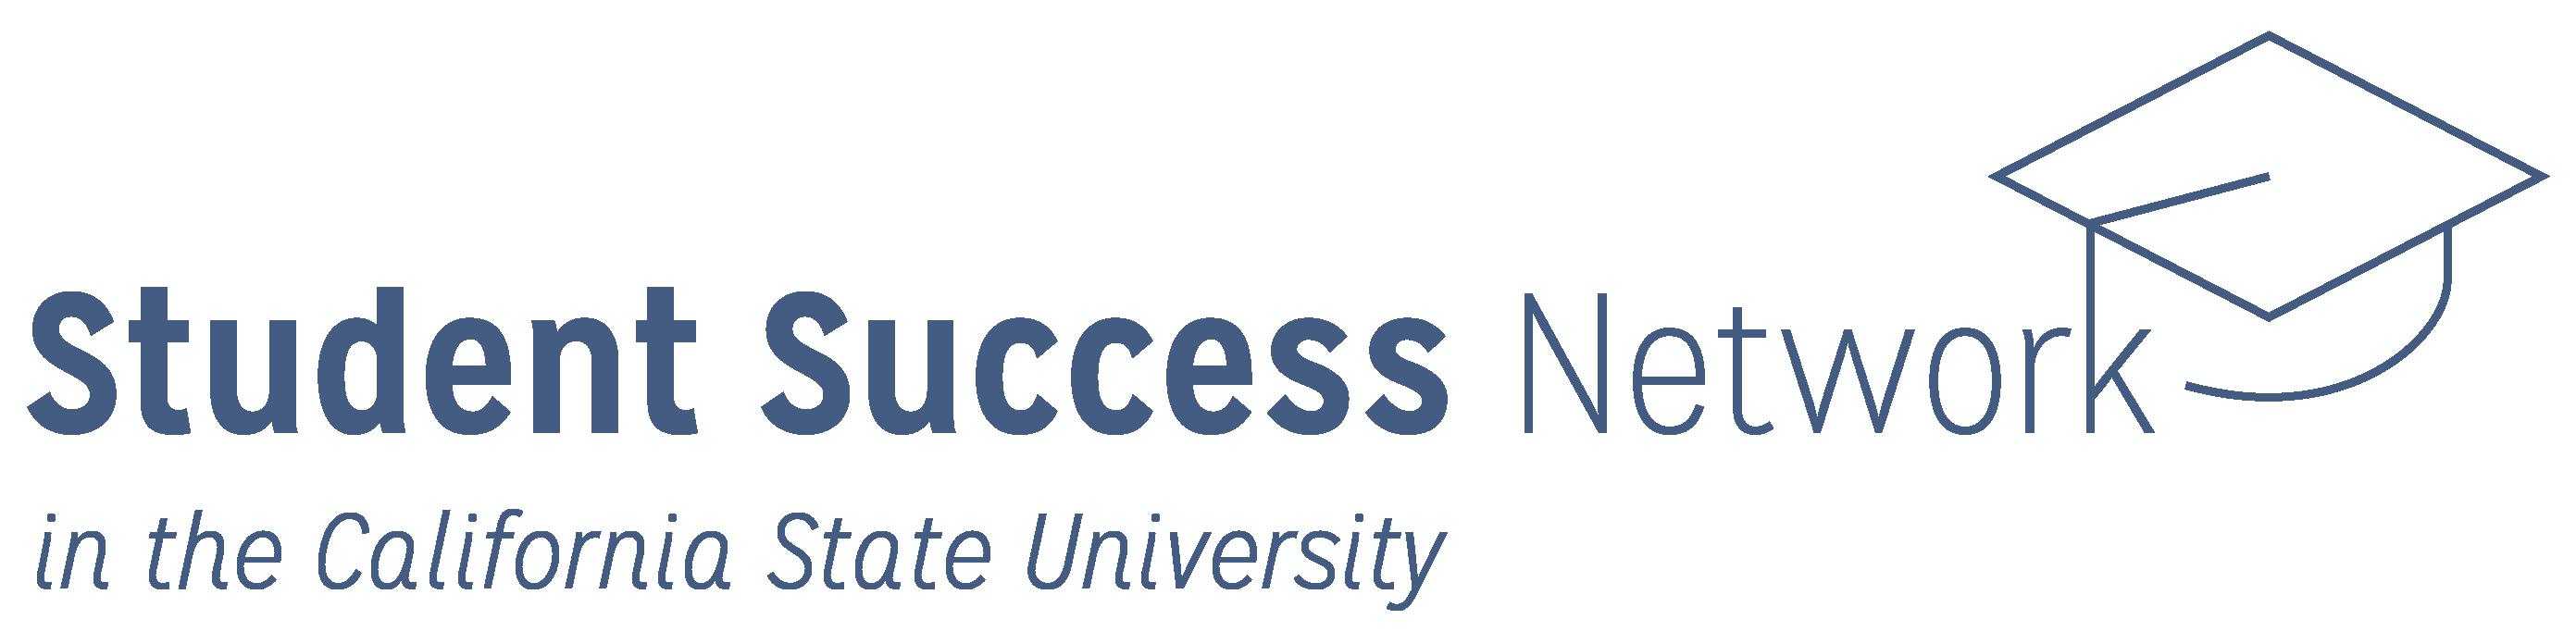 CSU Student Success Network Logo